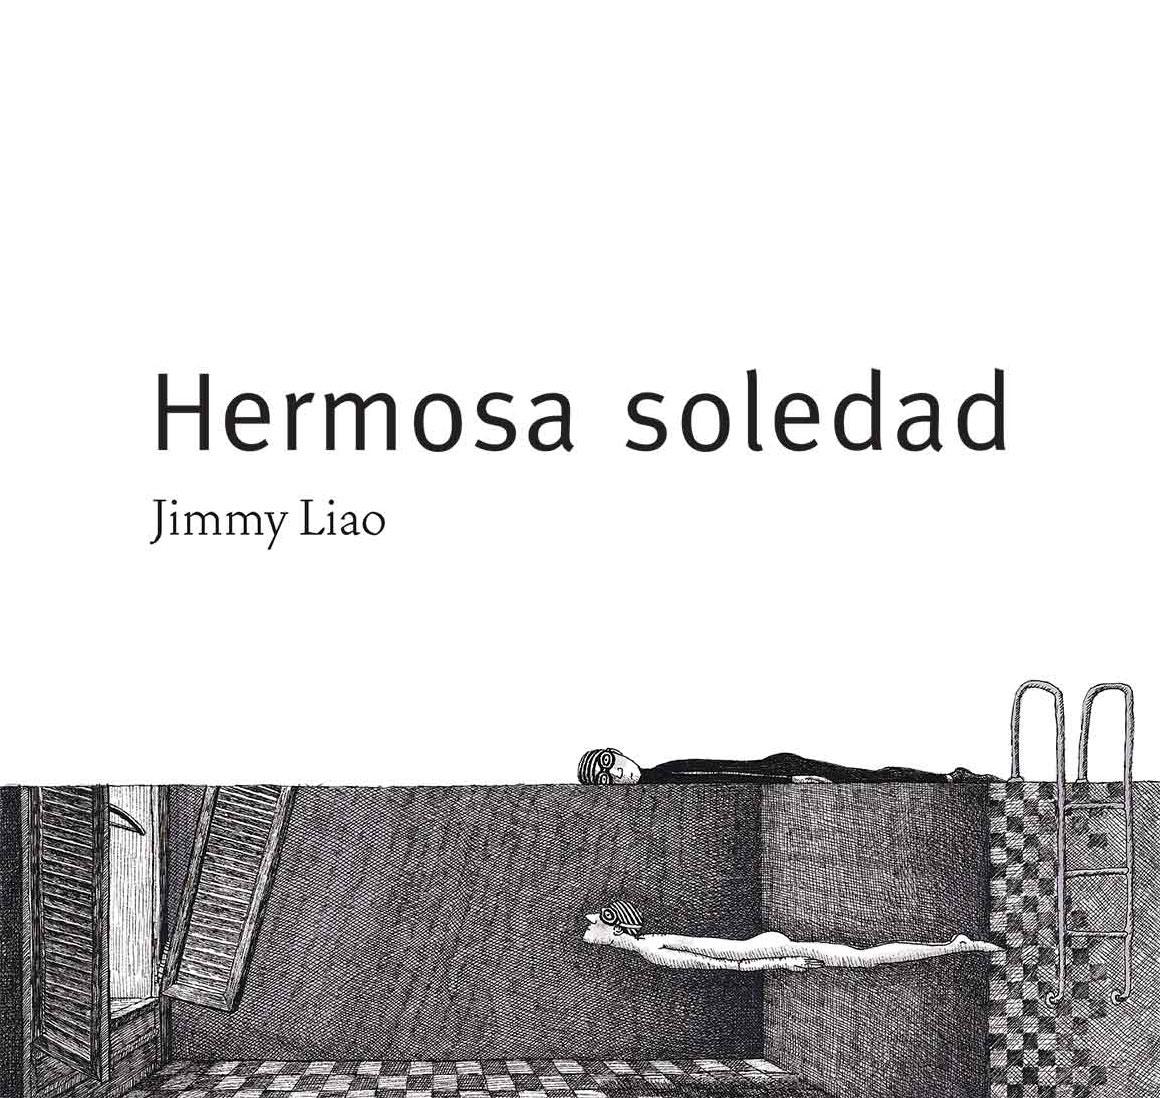 Hermosa soledad - Jimmy Liao